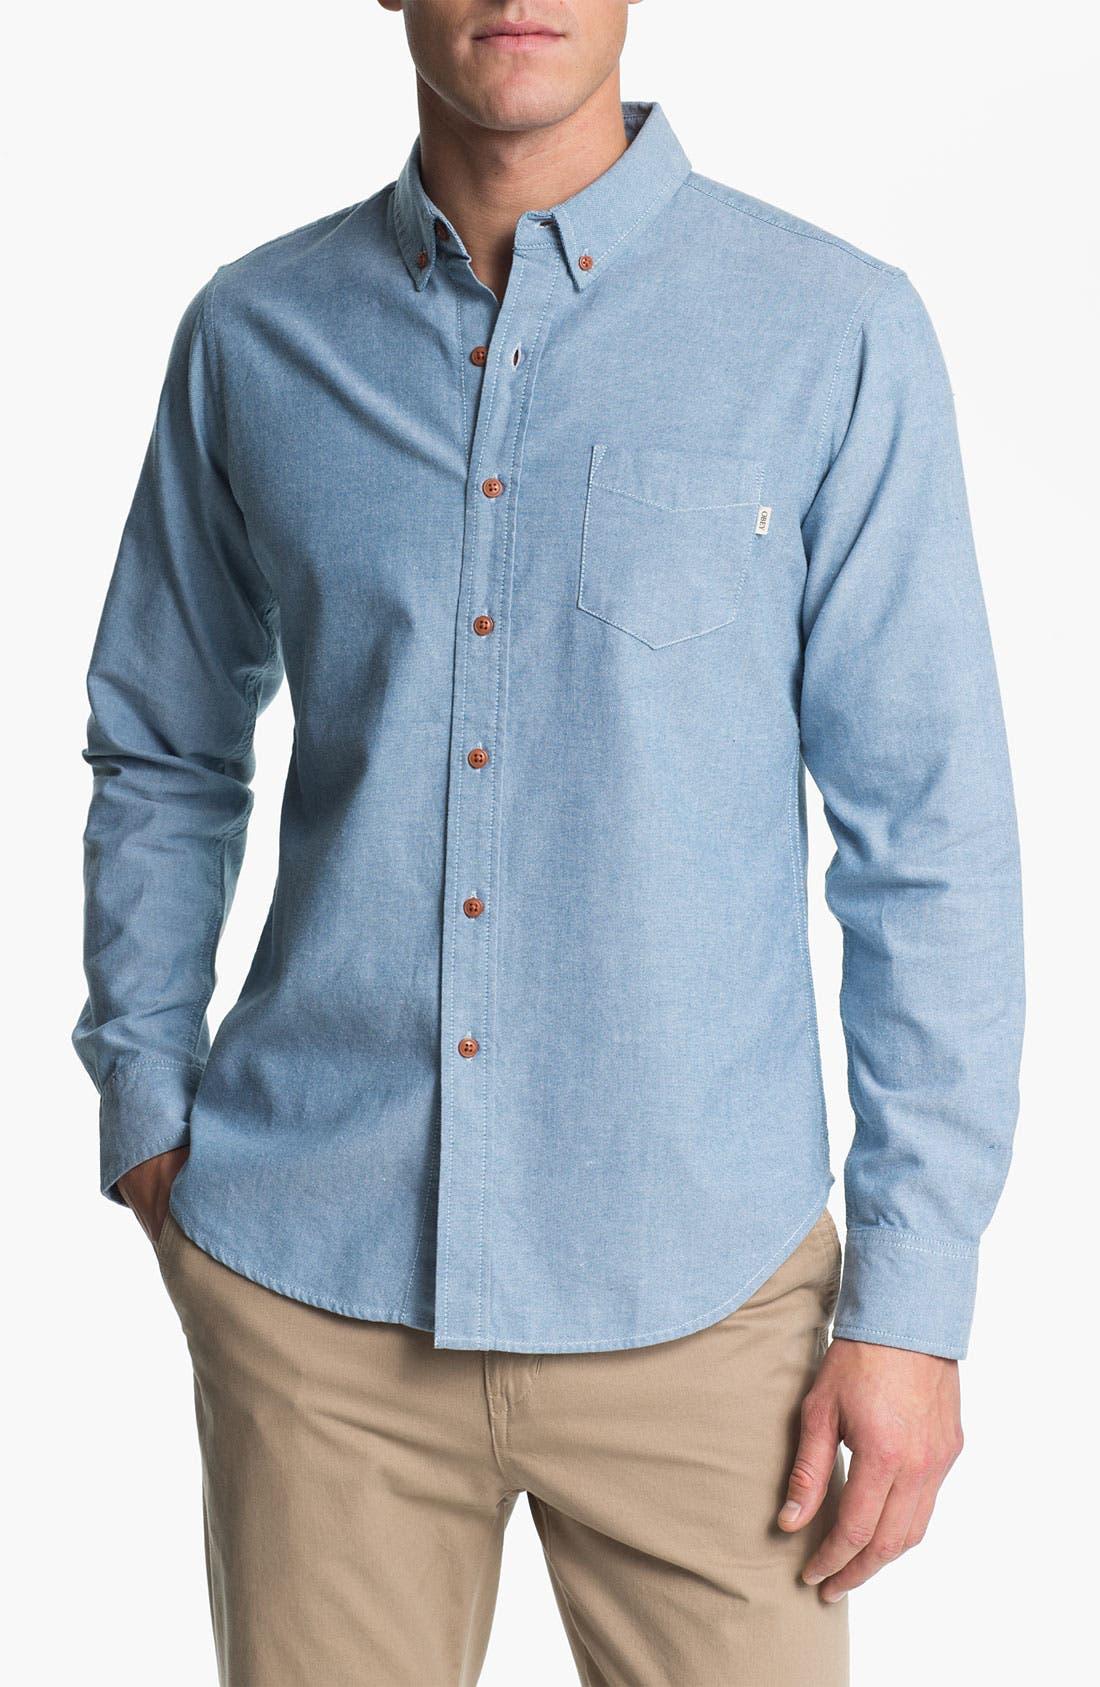 Main Image - Obey 'Ryan' Chambray Shirt